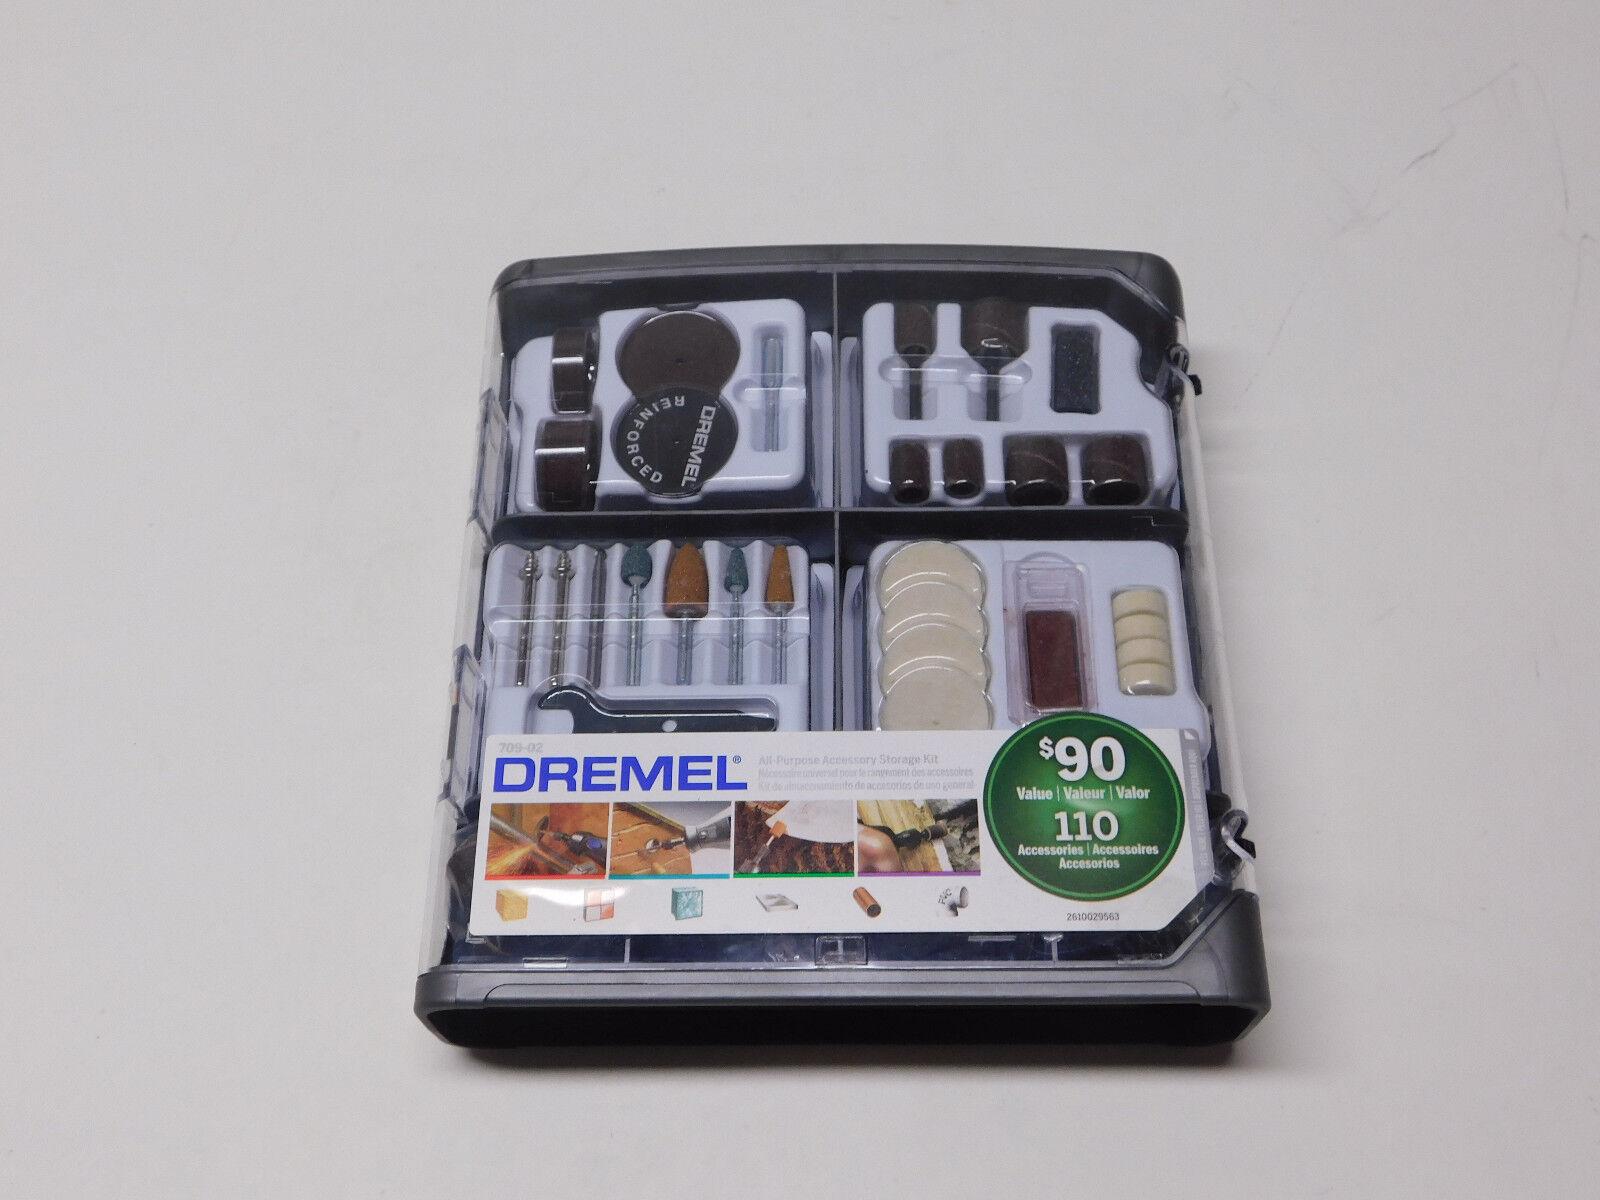 Dremel 709-02 Super Accessory Kit (110PC)